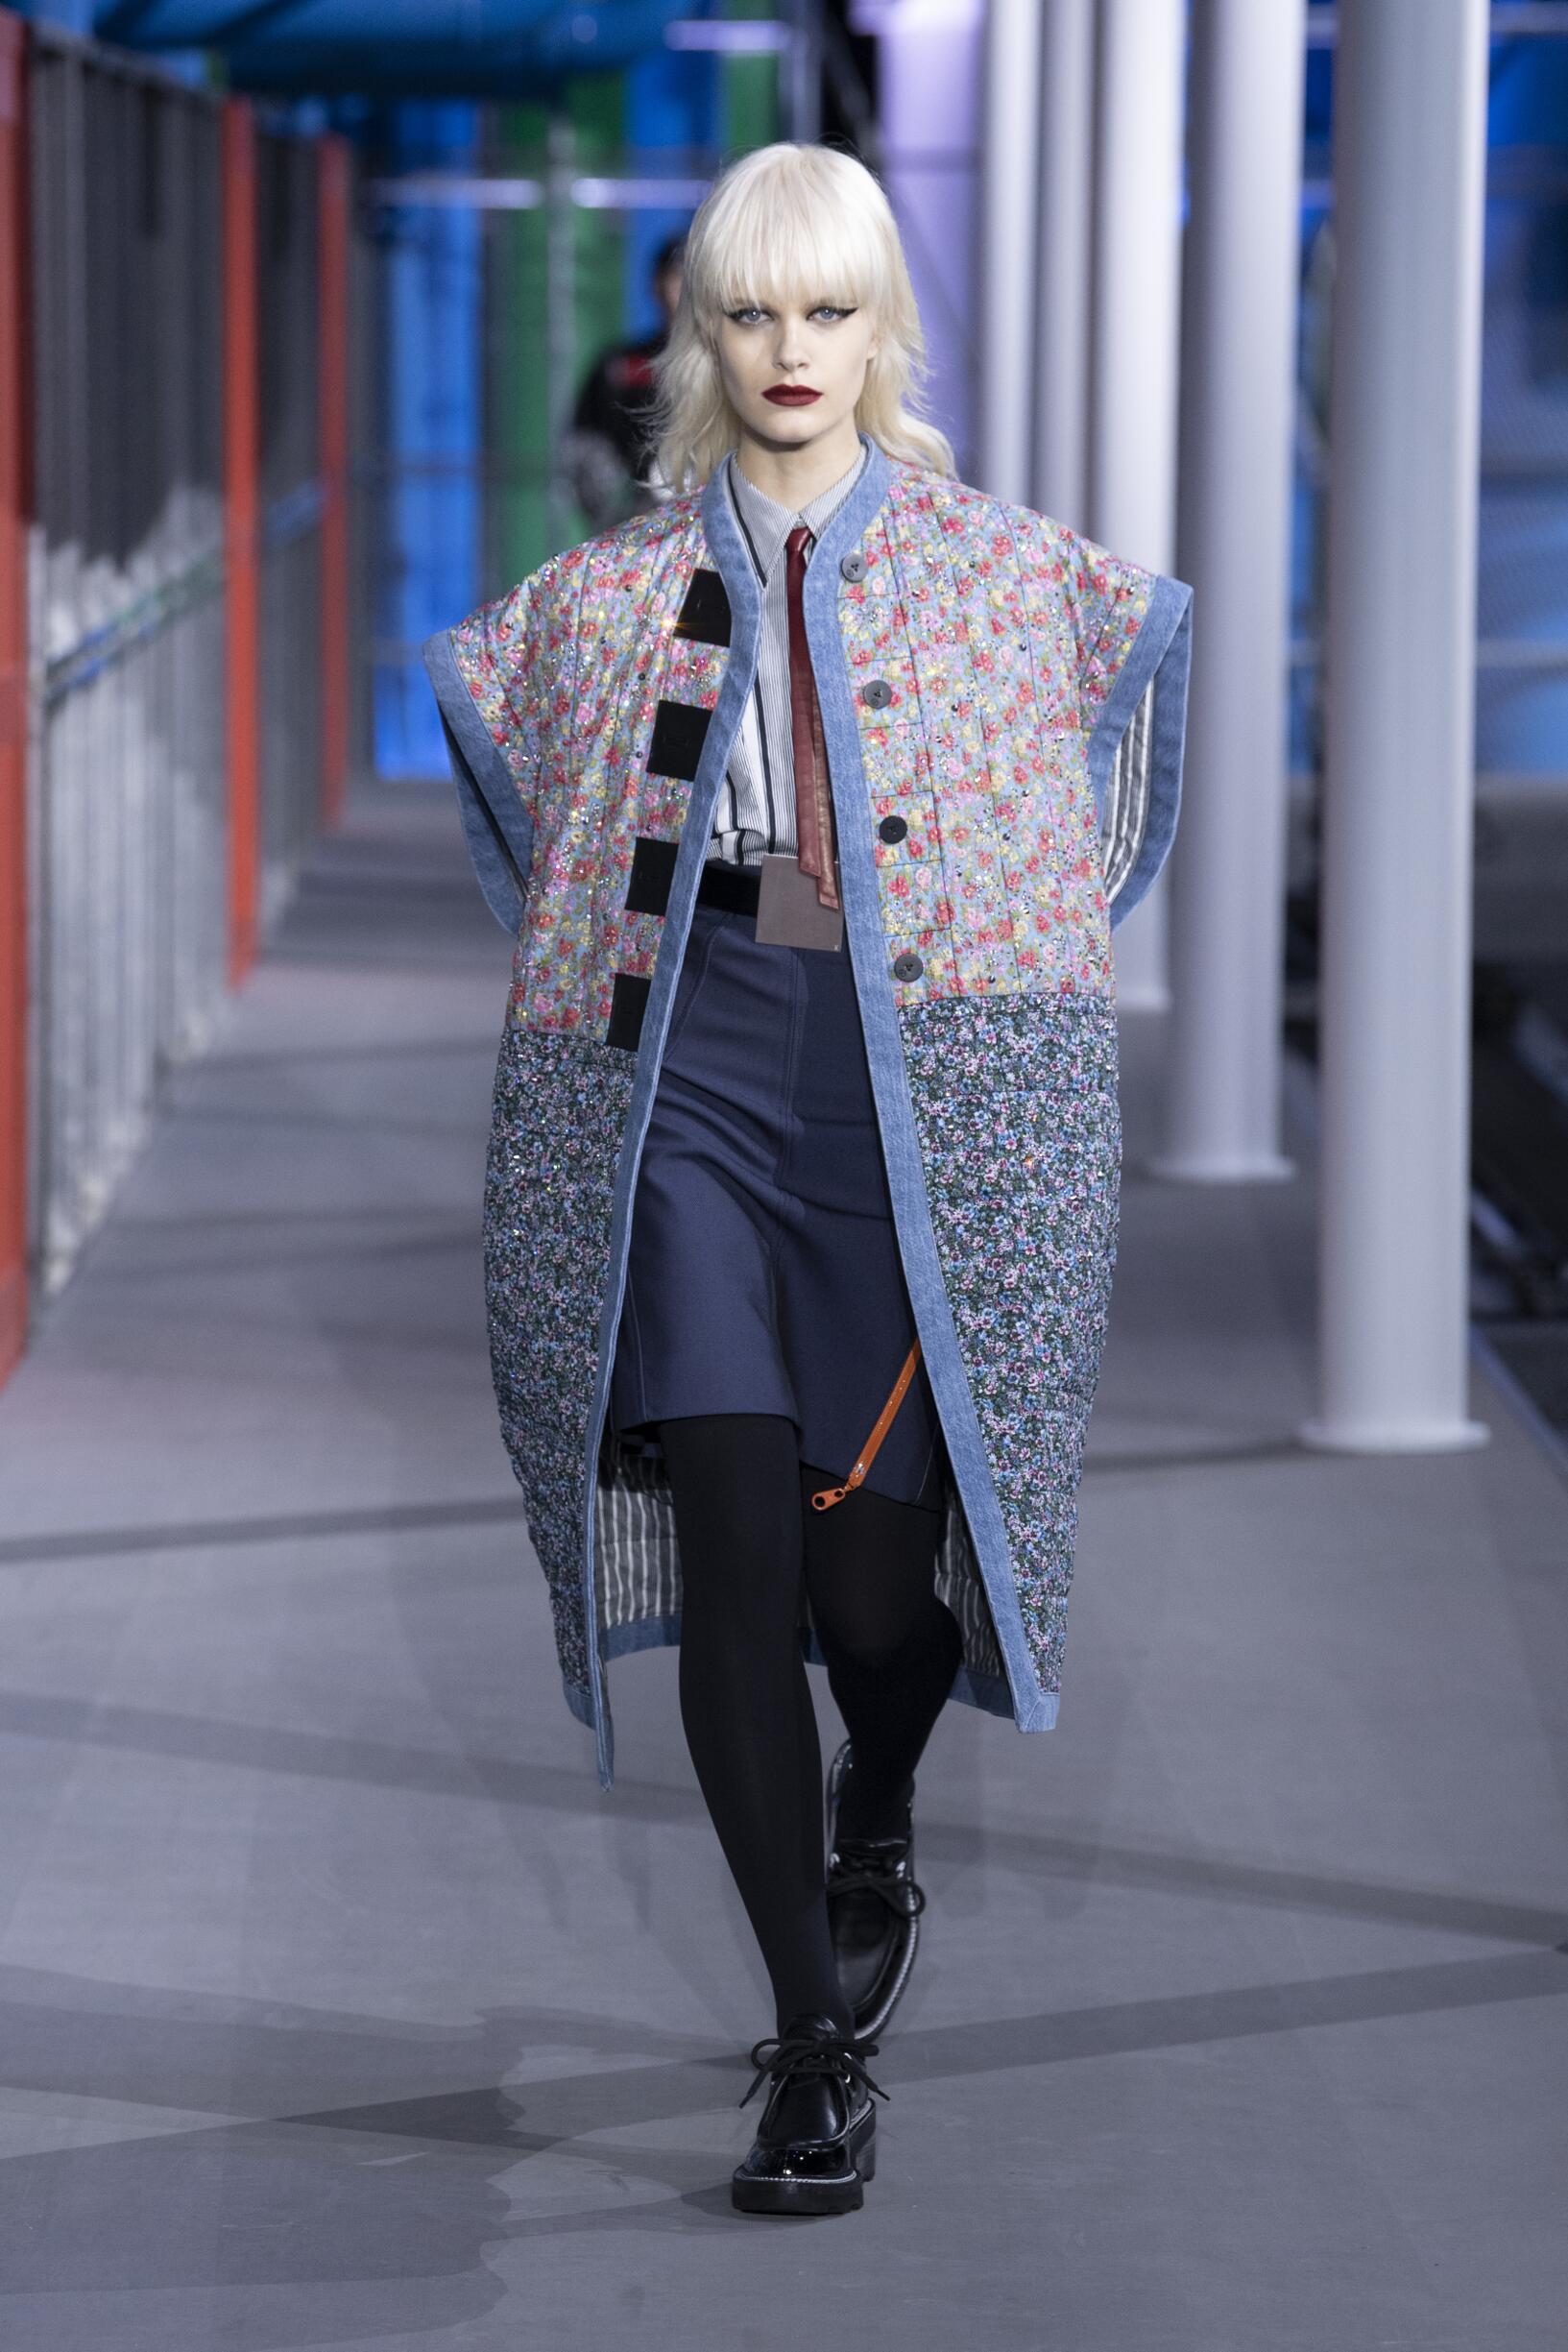 Louis Vuitton Fall Winter 2019